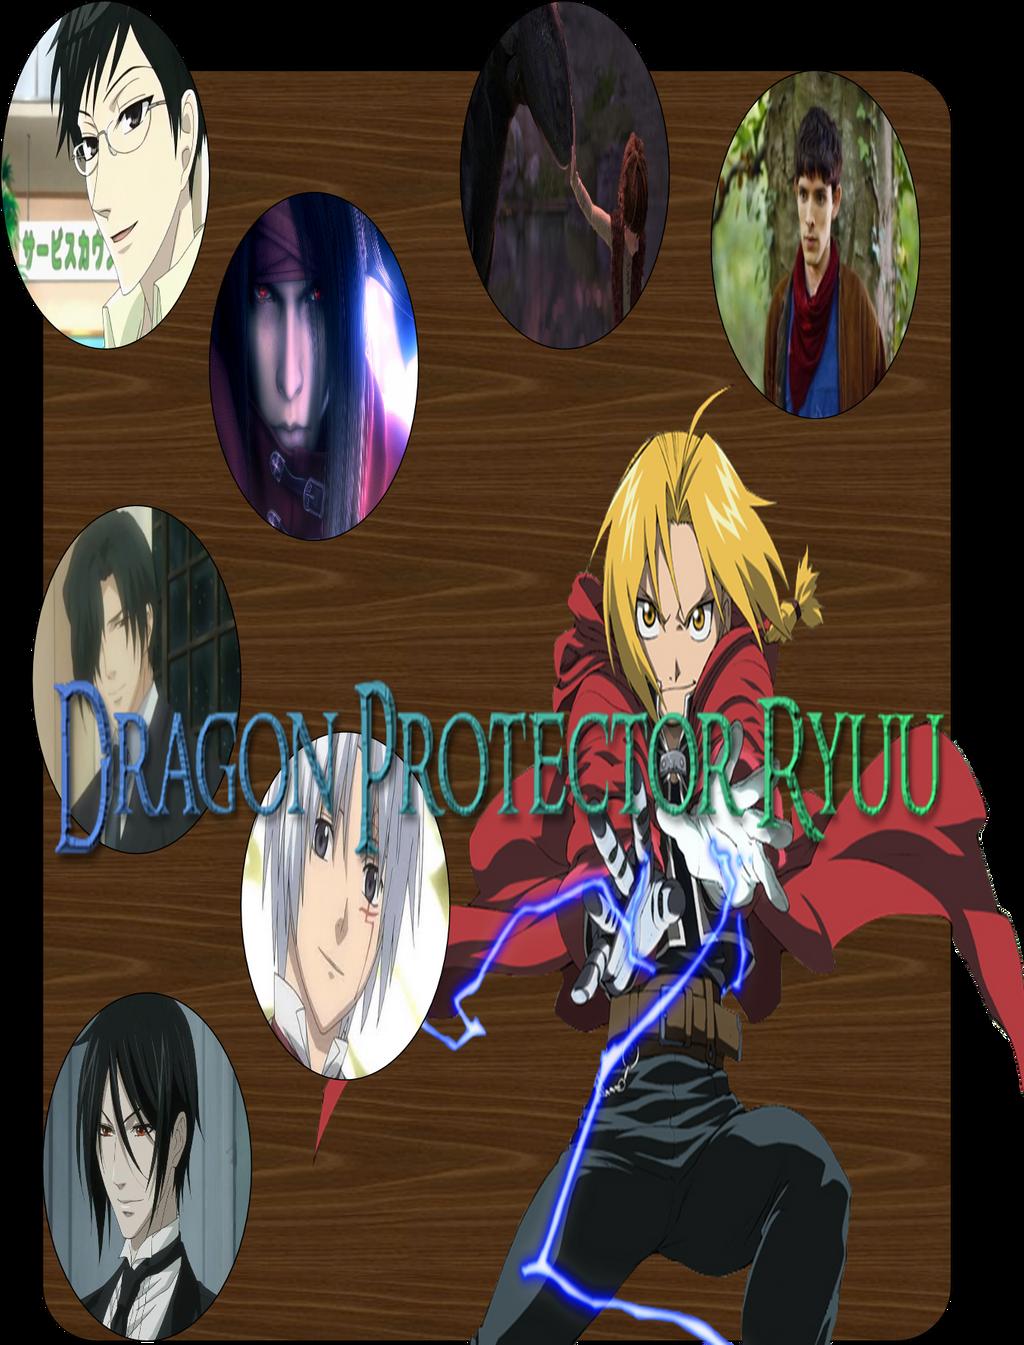 DragonprotectorRyuu's Profile Picture